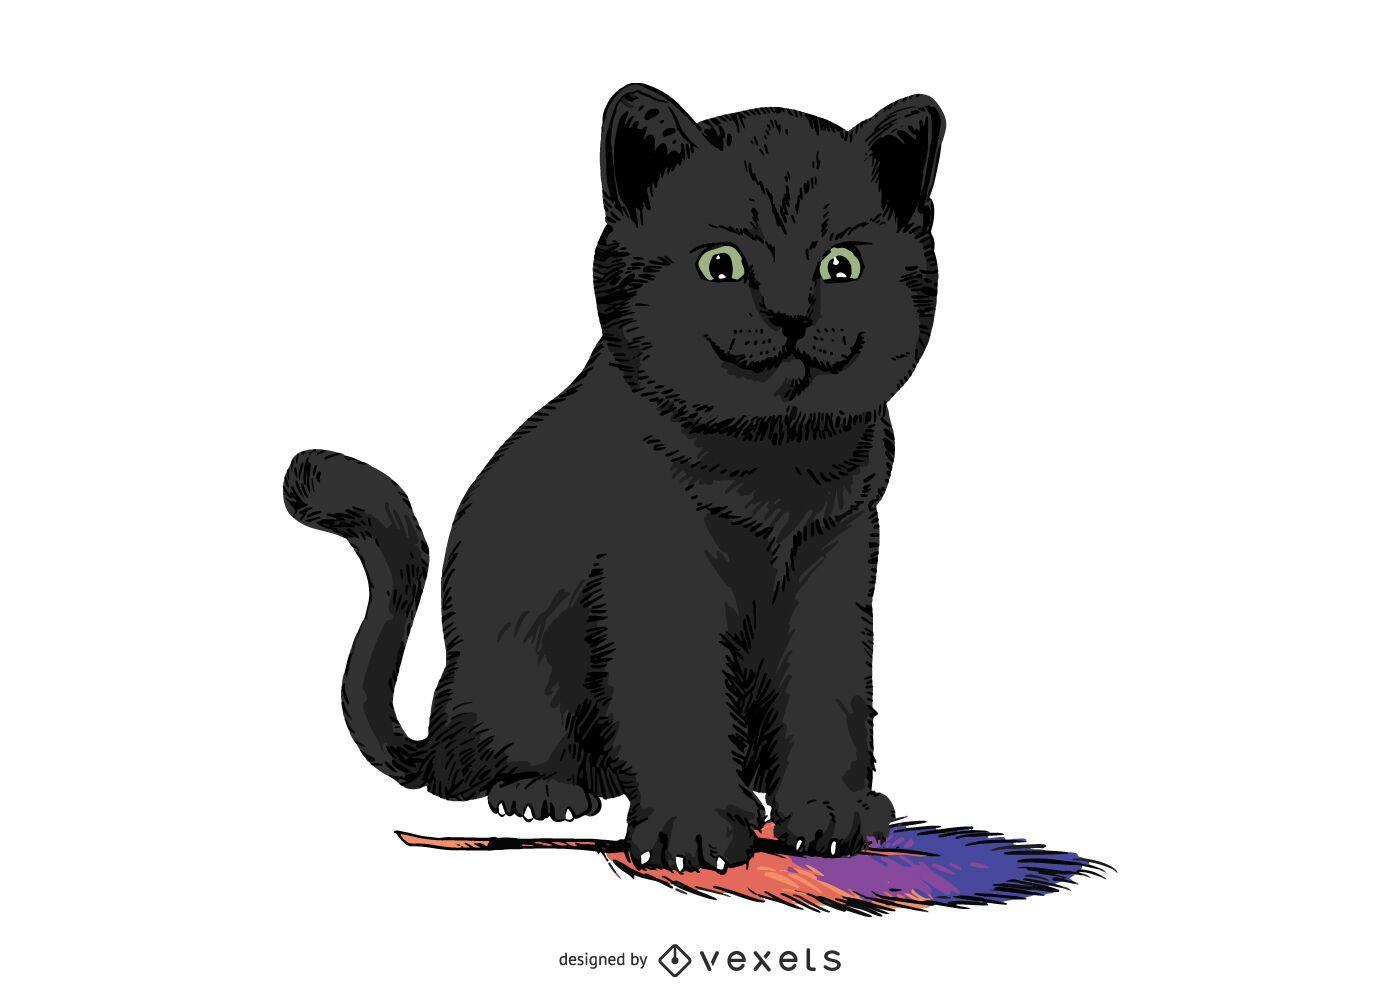 Dise?o de ilustraci?n de pluma de gato negro